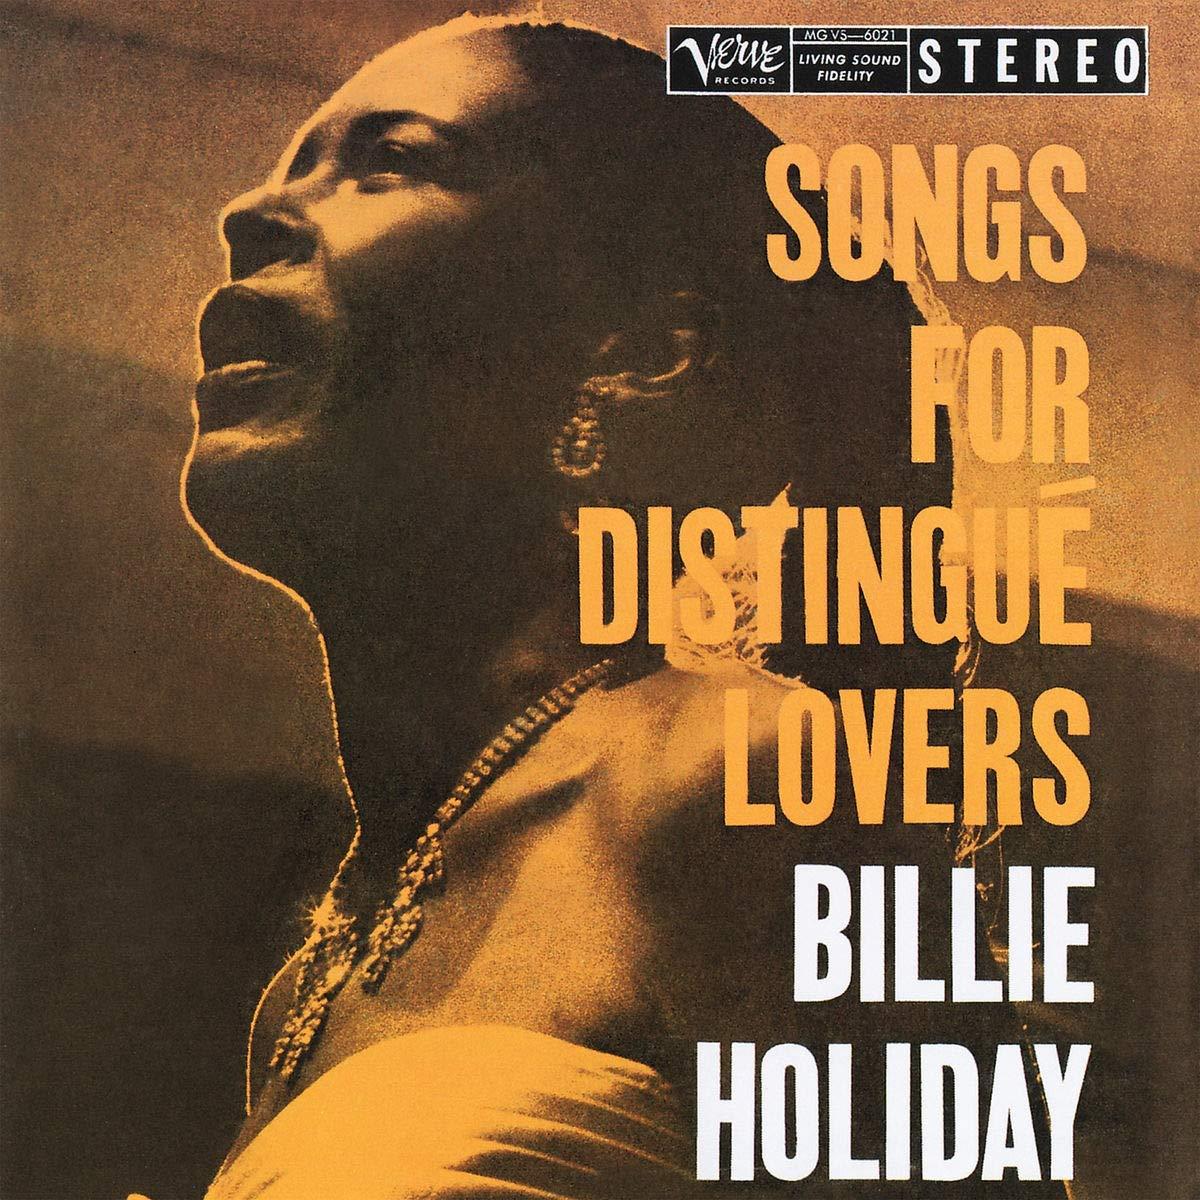 лучшая цена Билли Холидей Billie Holiday. Songs For Distingue Lovers (LP)